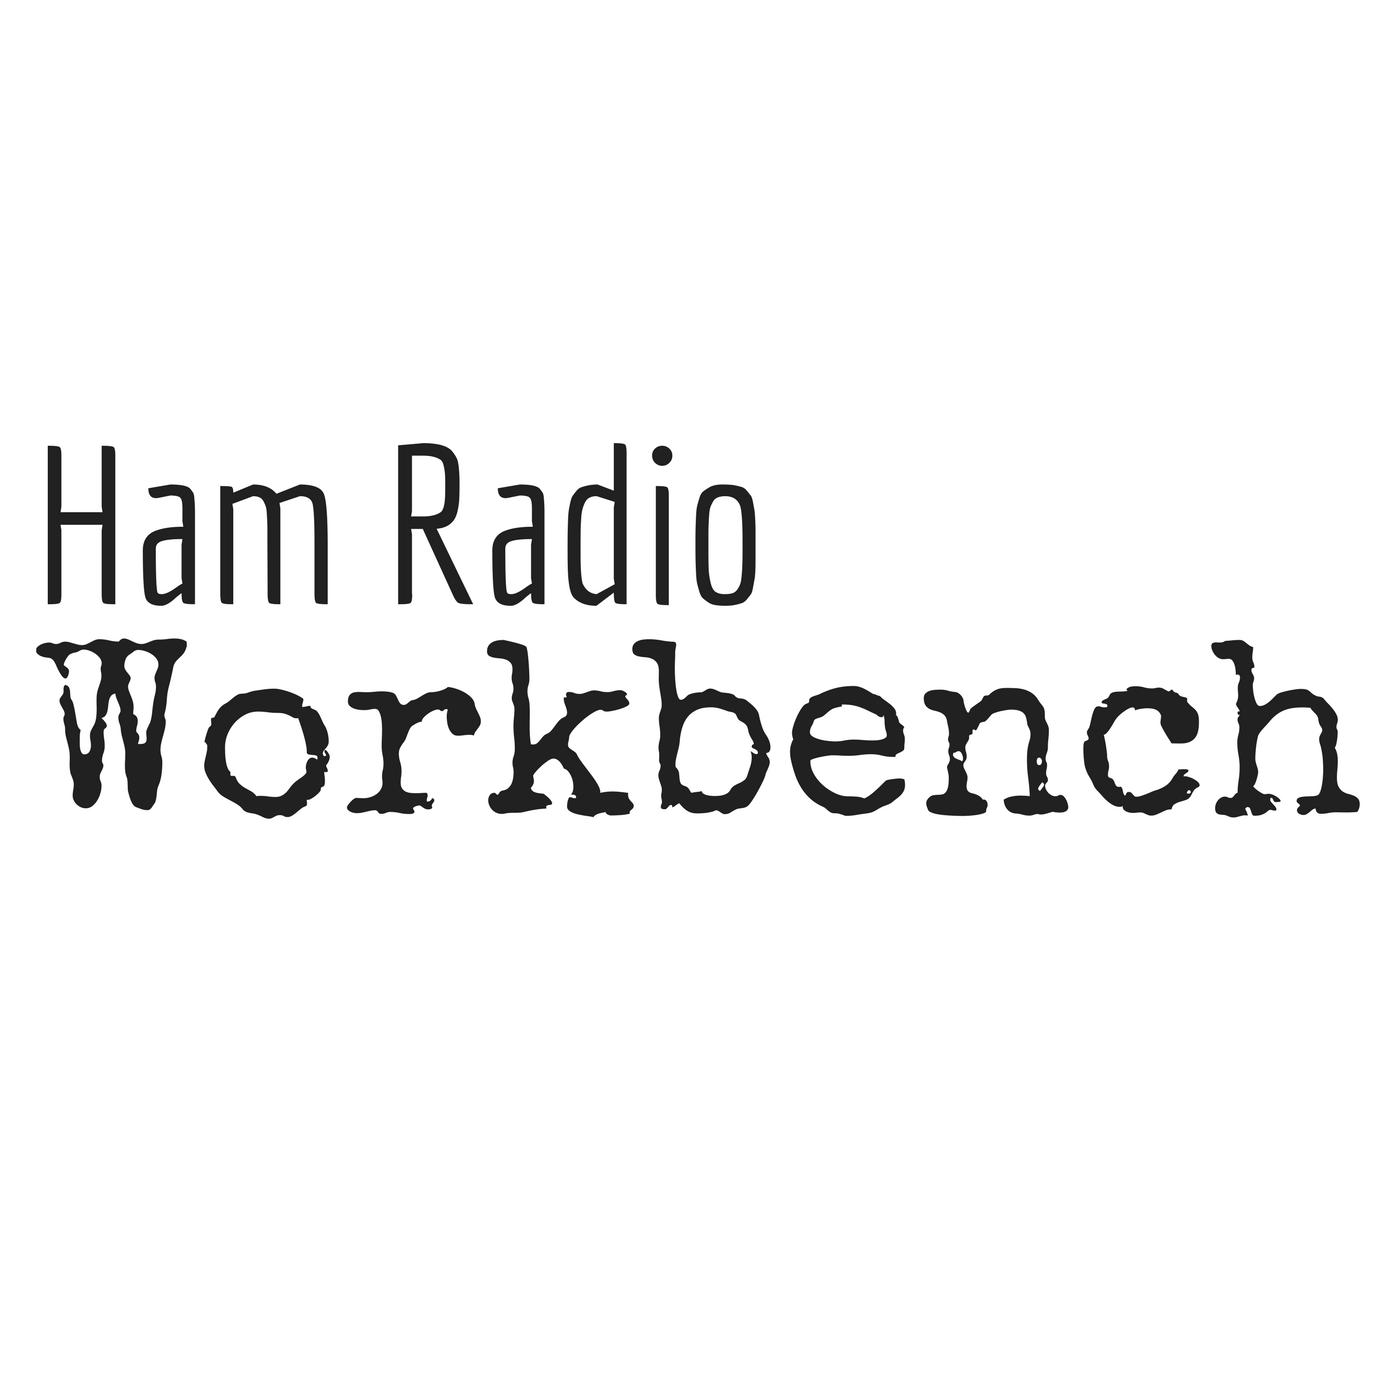 Ham Radio Workbench Podcast | Podbay